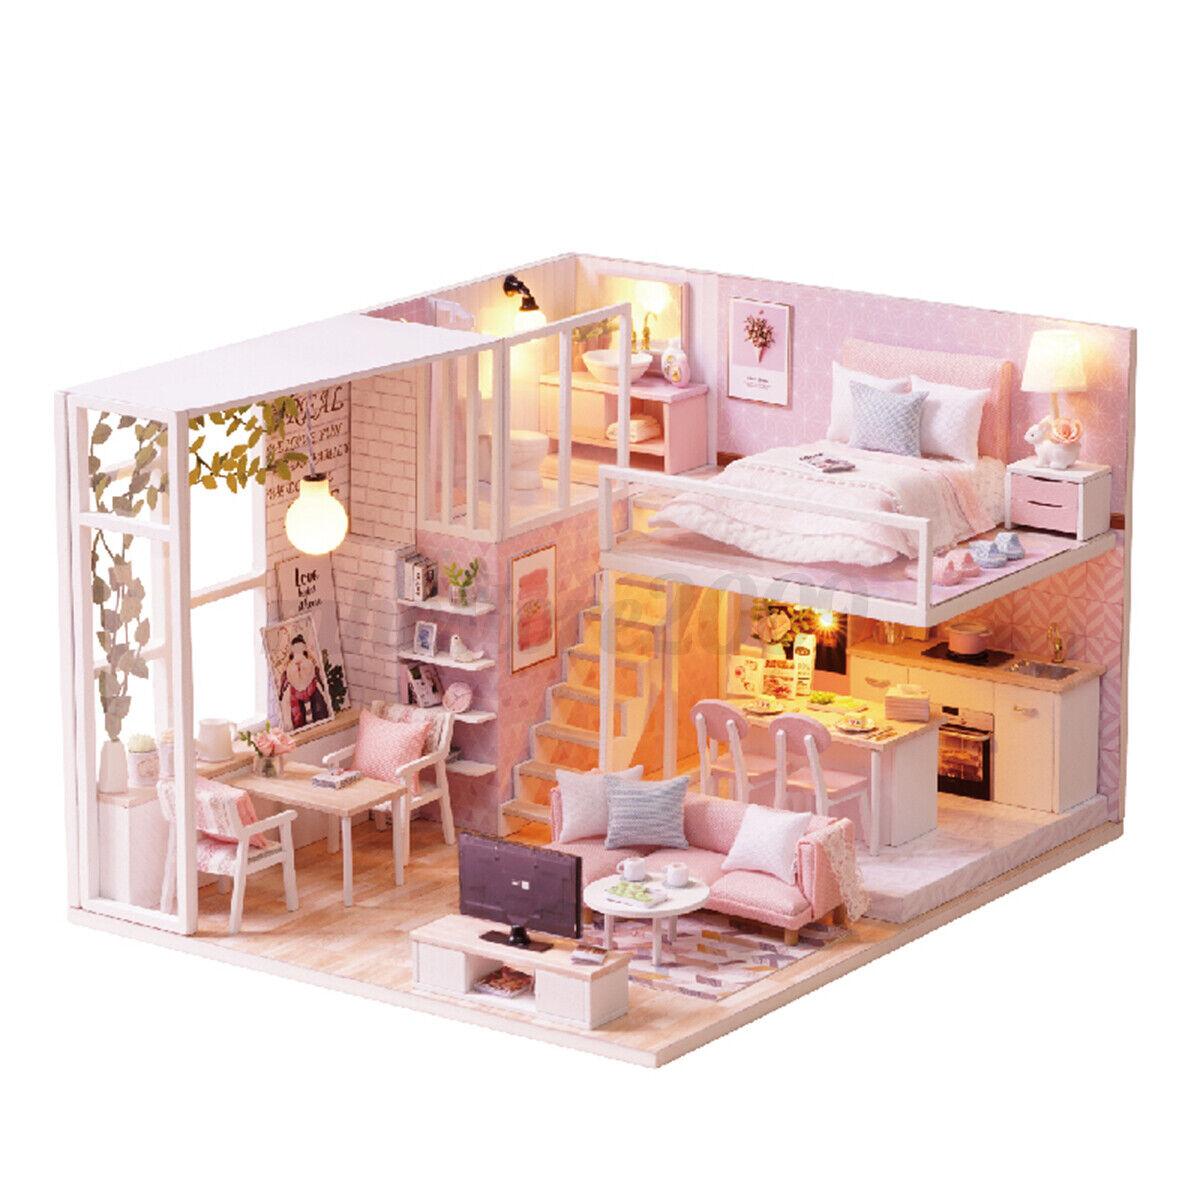 1//124 DIY Dollhouse Wooden Miniature Furniture Kit Mini 3D House with LED /&